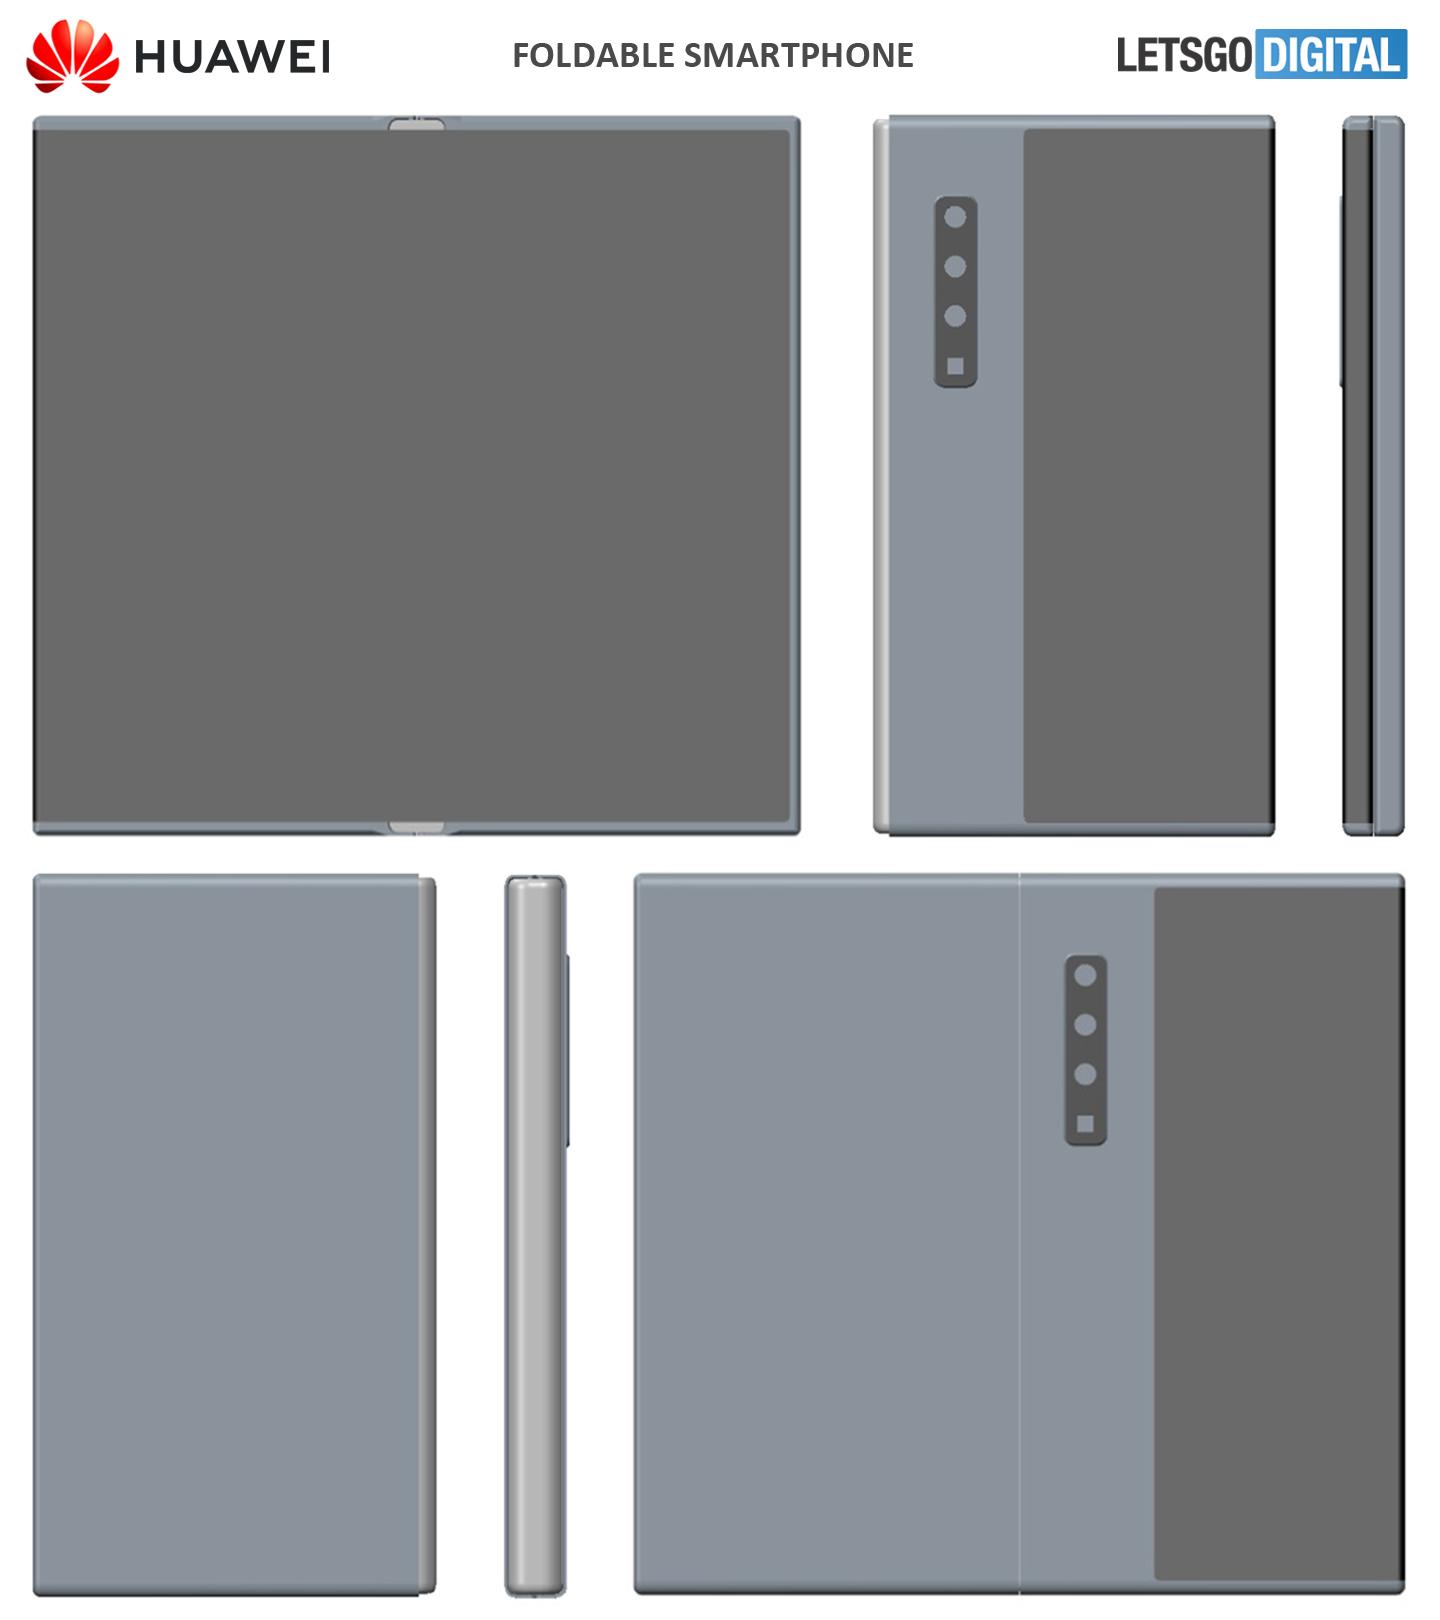 huawei foldable phone patent letsgodigital